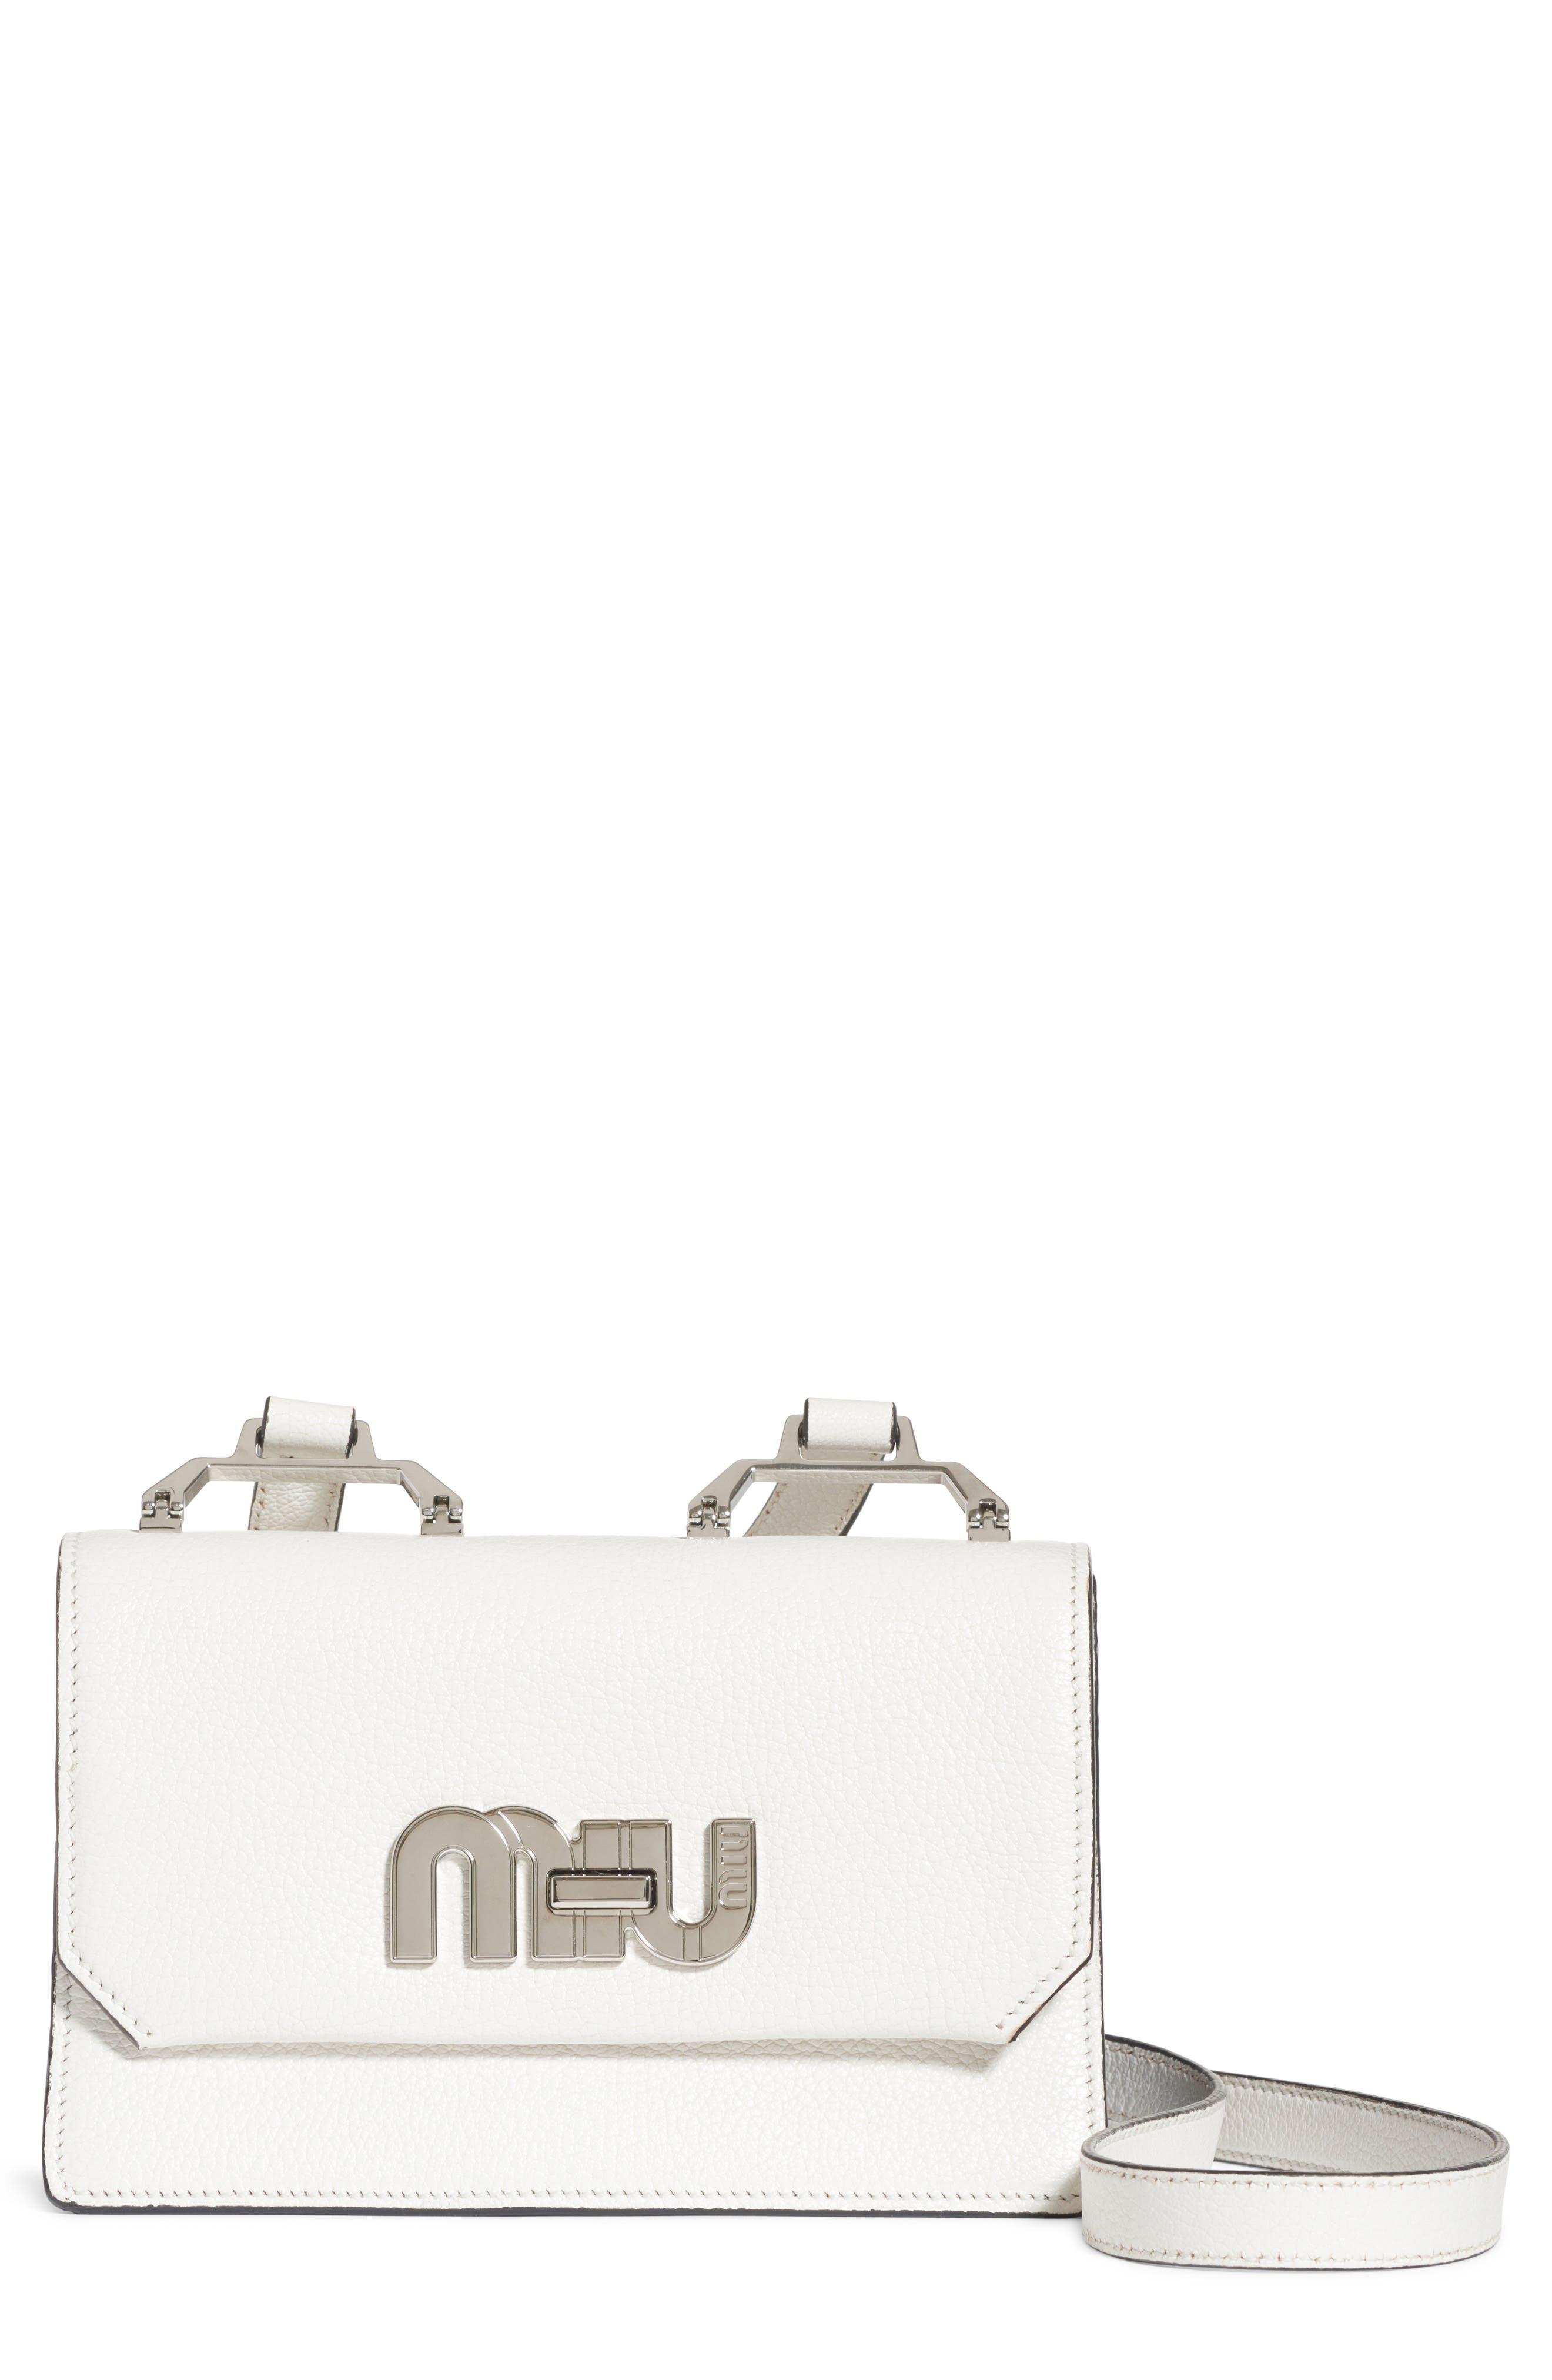 Leather Crossbody Bag,                         Main,                         color, Bianco/ Baltico